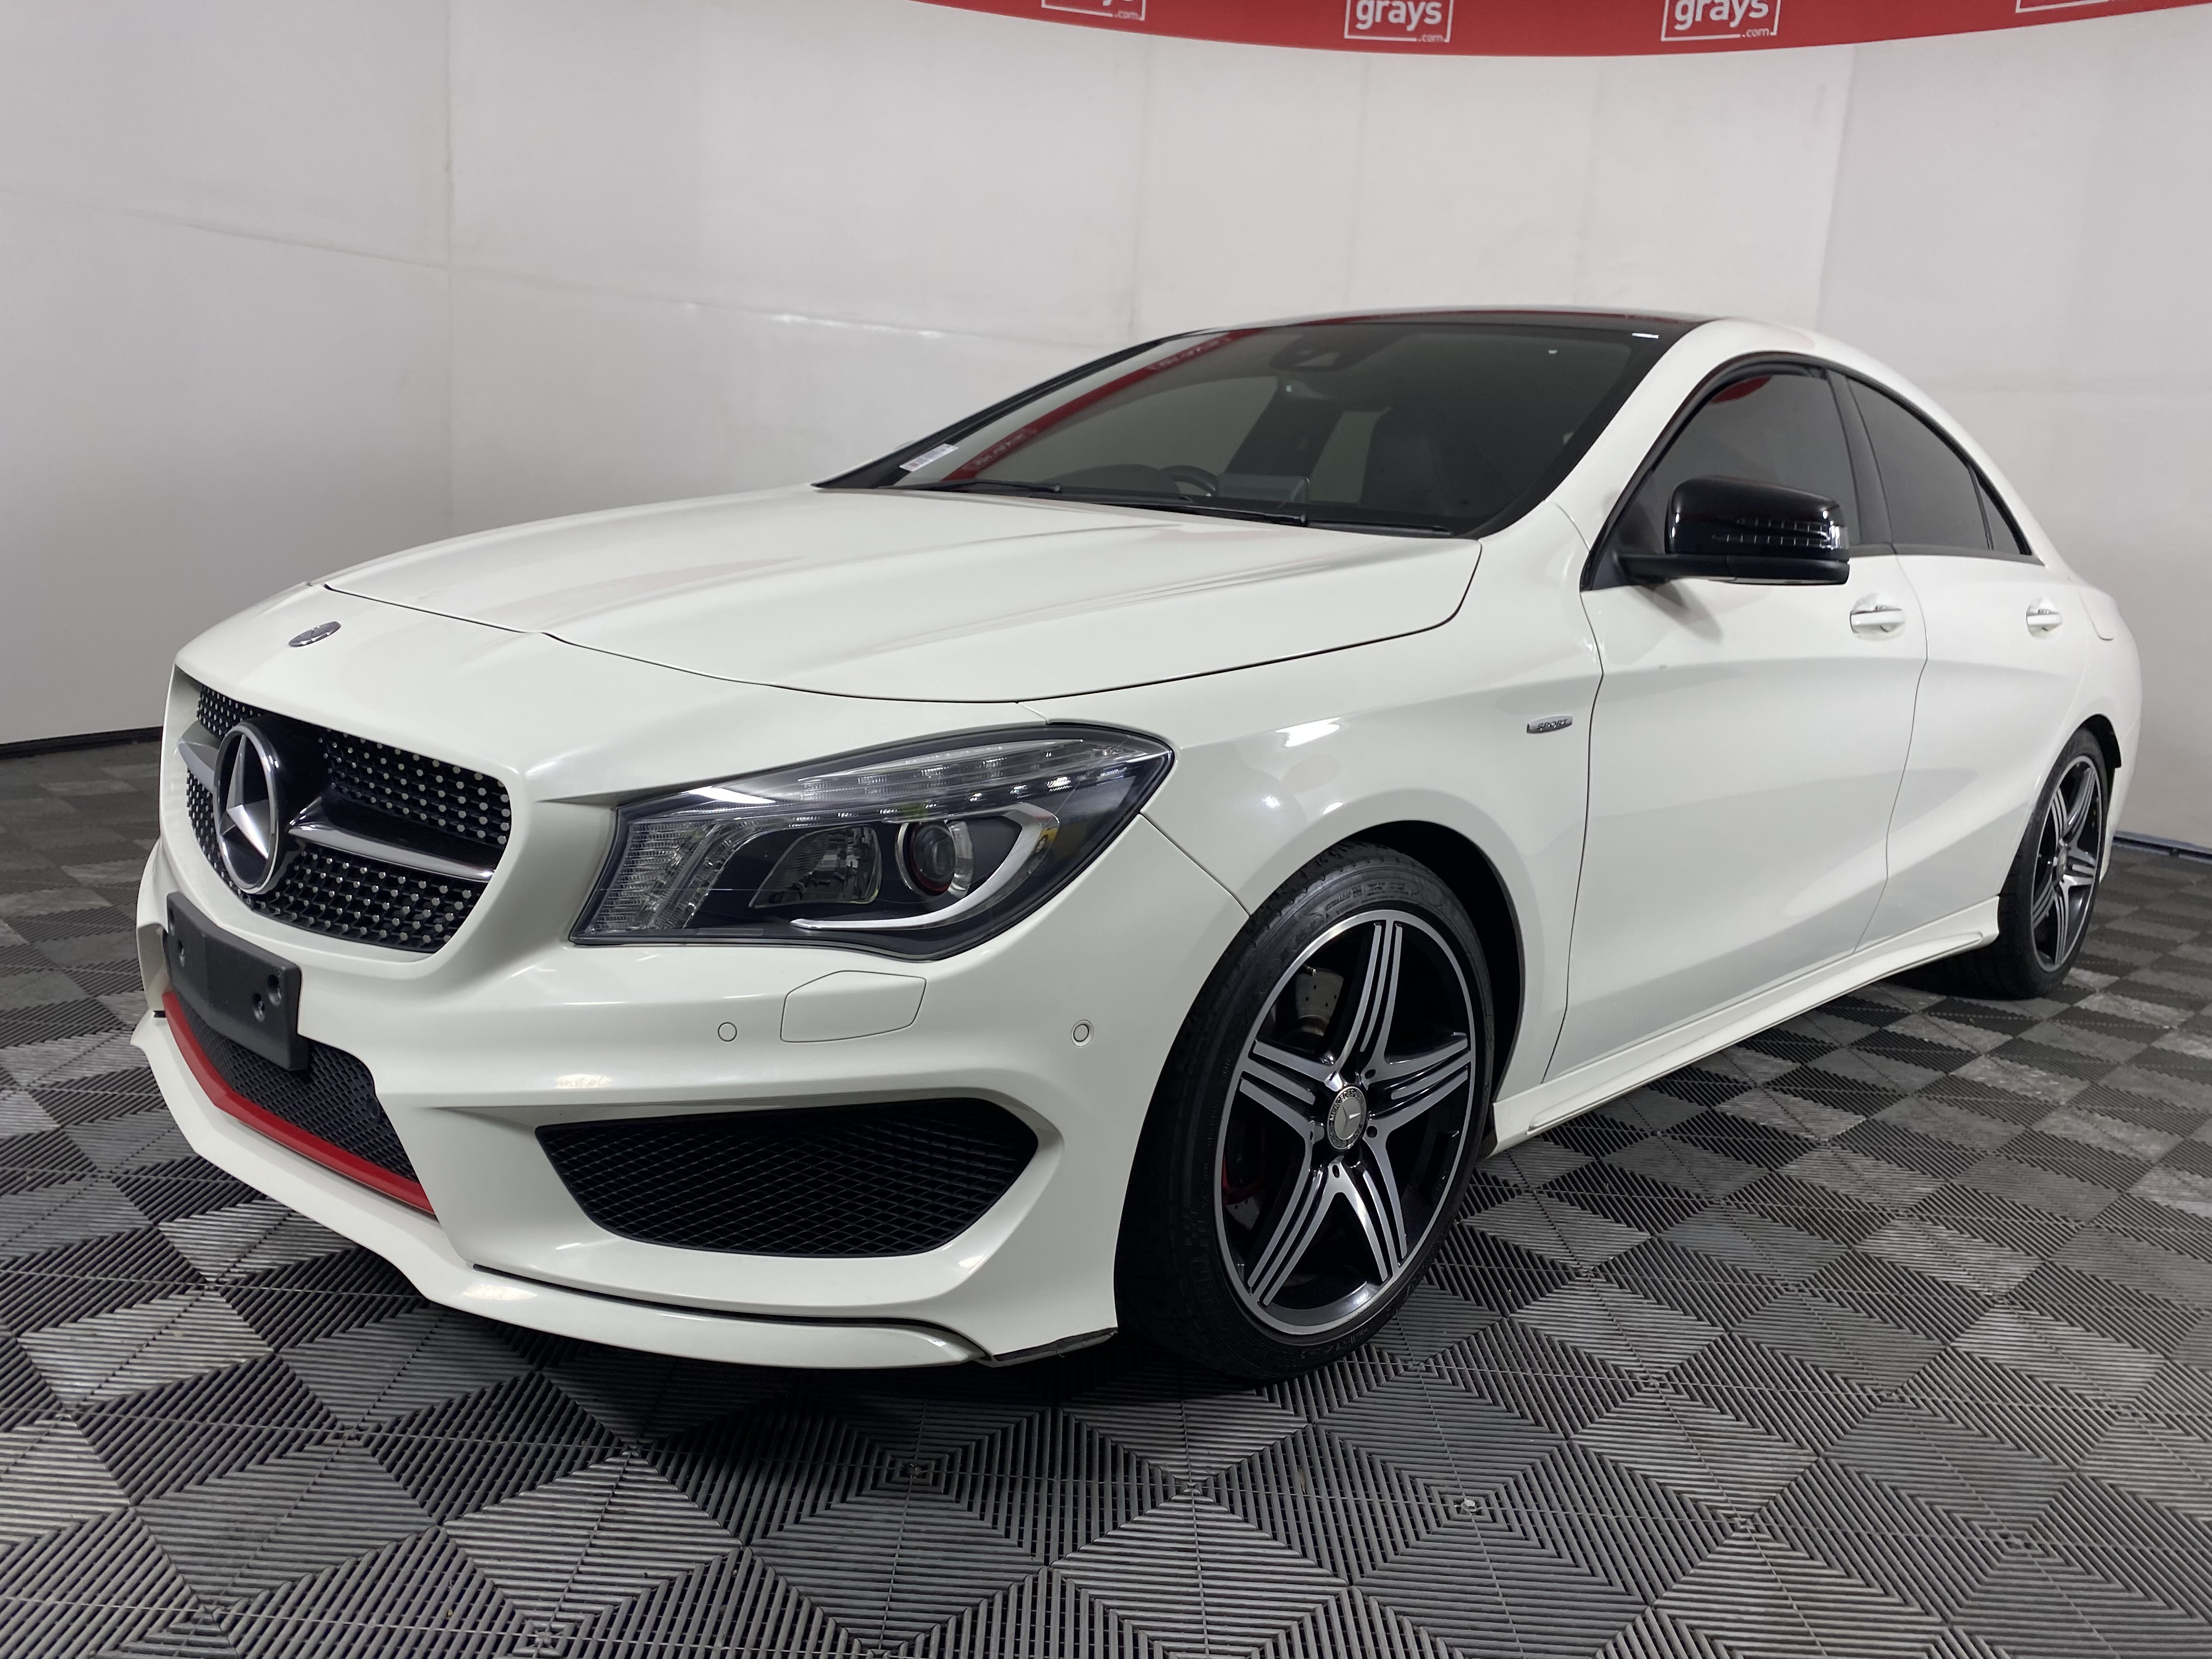 2015 Mercedes Benz CLA250 SPORT 4MATIC C117 Auto Coupe 97,678km